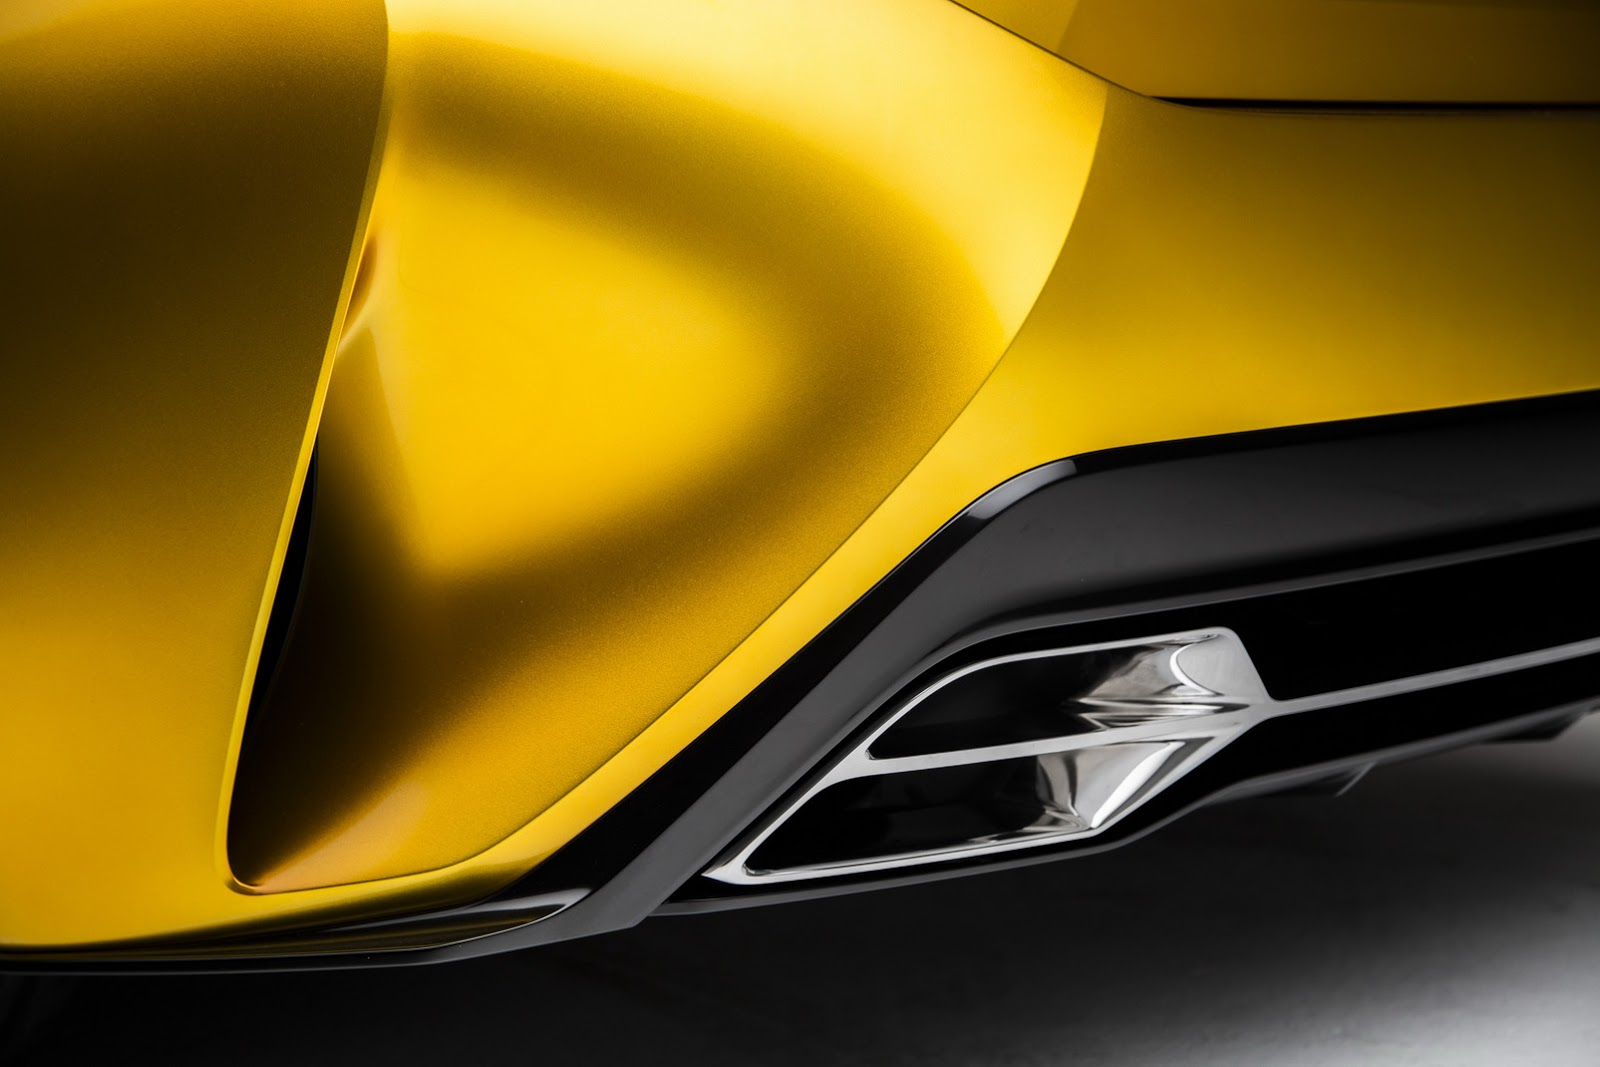 http://4.bp.blogspot.com/-adK-QTJ77tw/VG0P9zHE4VI/AAAAAAAAa3I/av_i_-w079Q/s1600/Lexus-LF-C2-Concept-27E.jpg